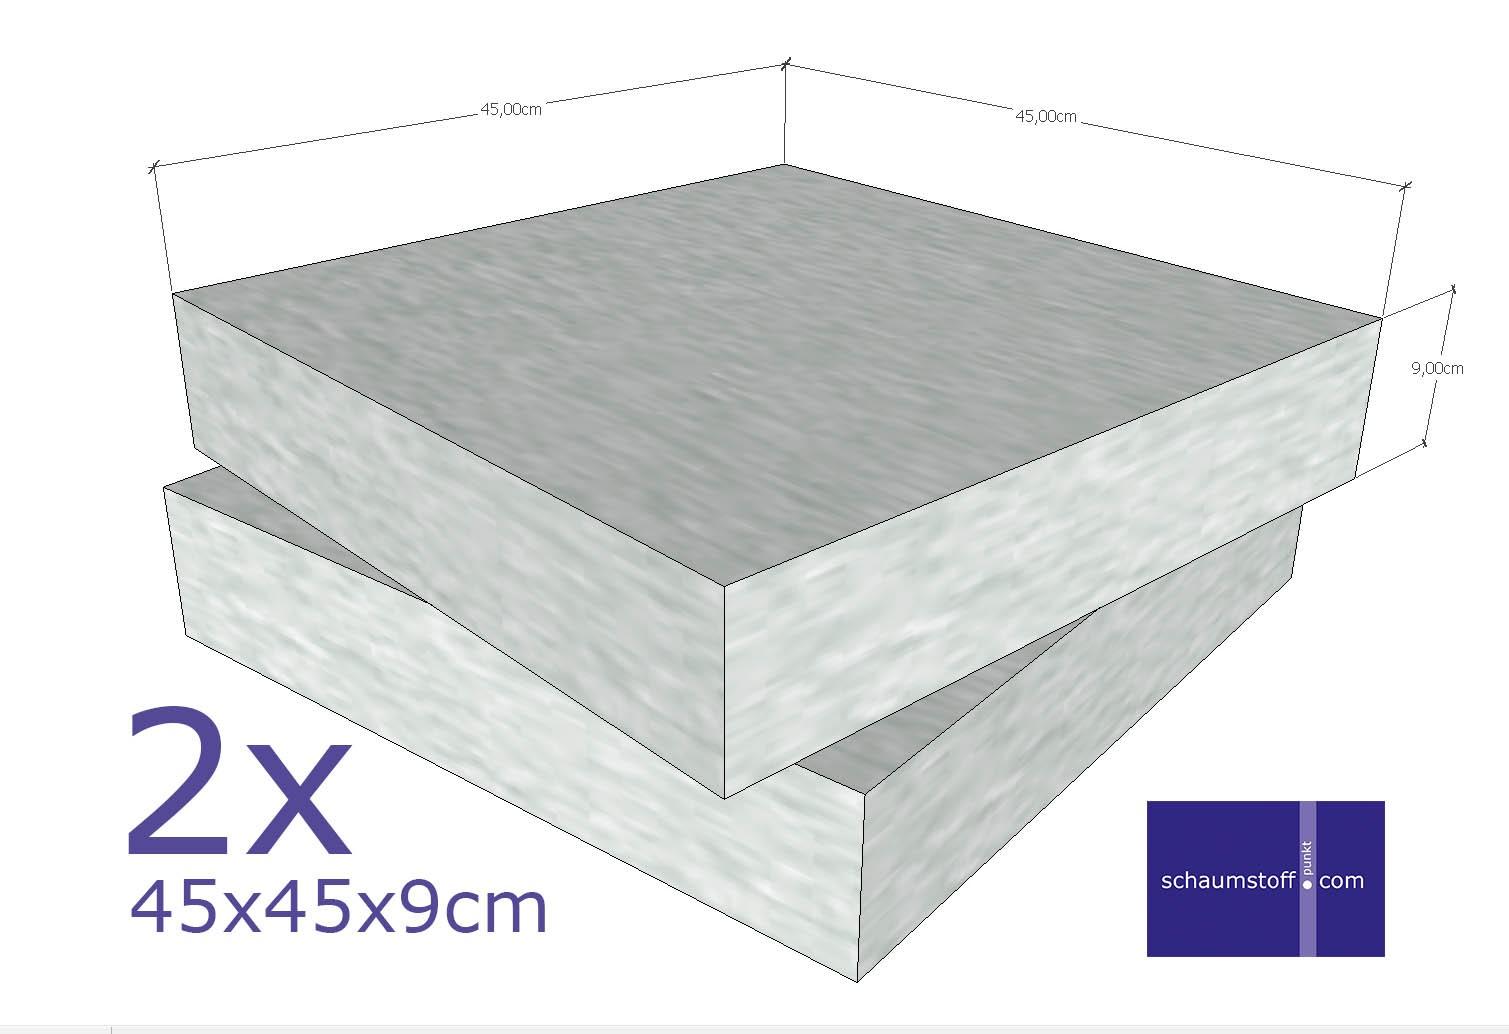 schaumstoff platten set 2 st ck a 45 x 45 x 9 cm sehr feste qualit t rg 40 sh 60. Black Bedroom Furniture Sets. Home Design Ideas